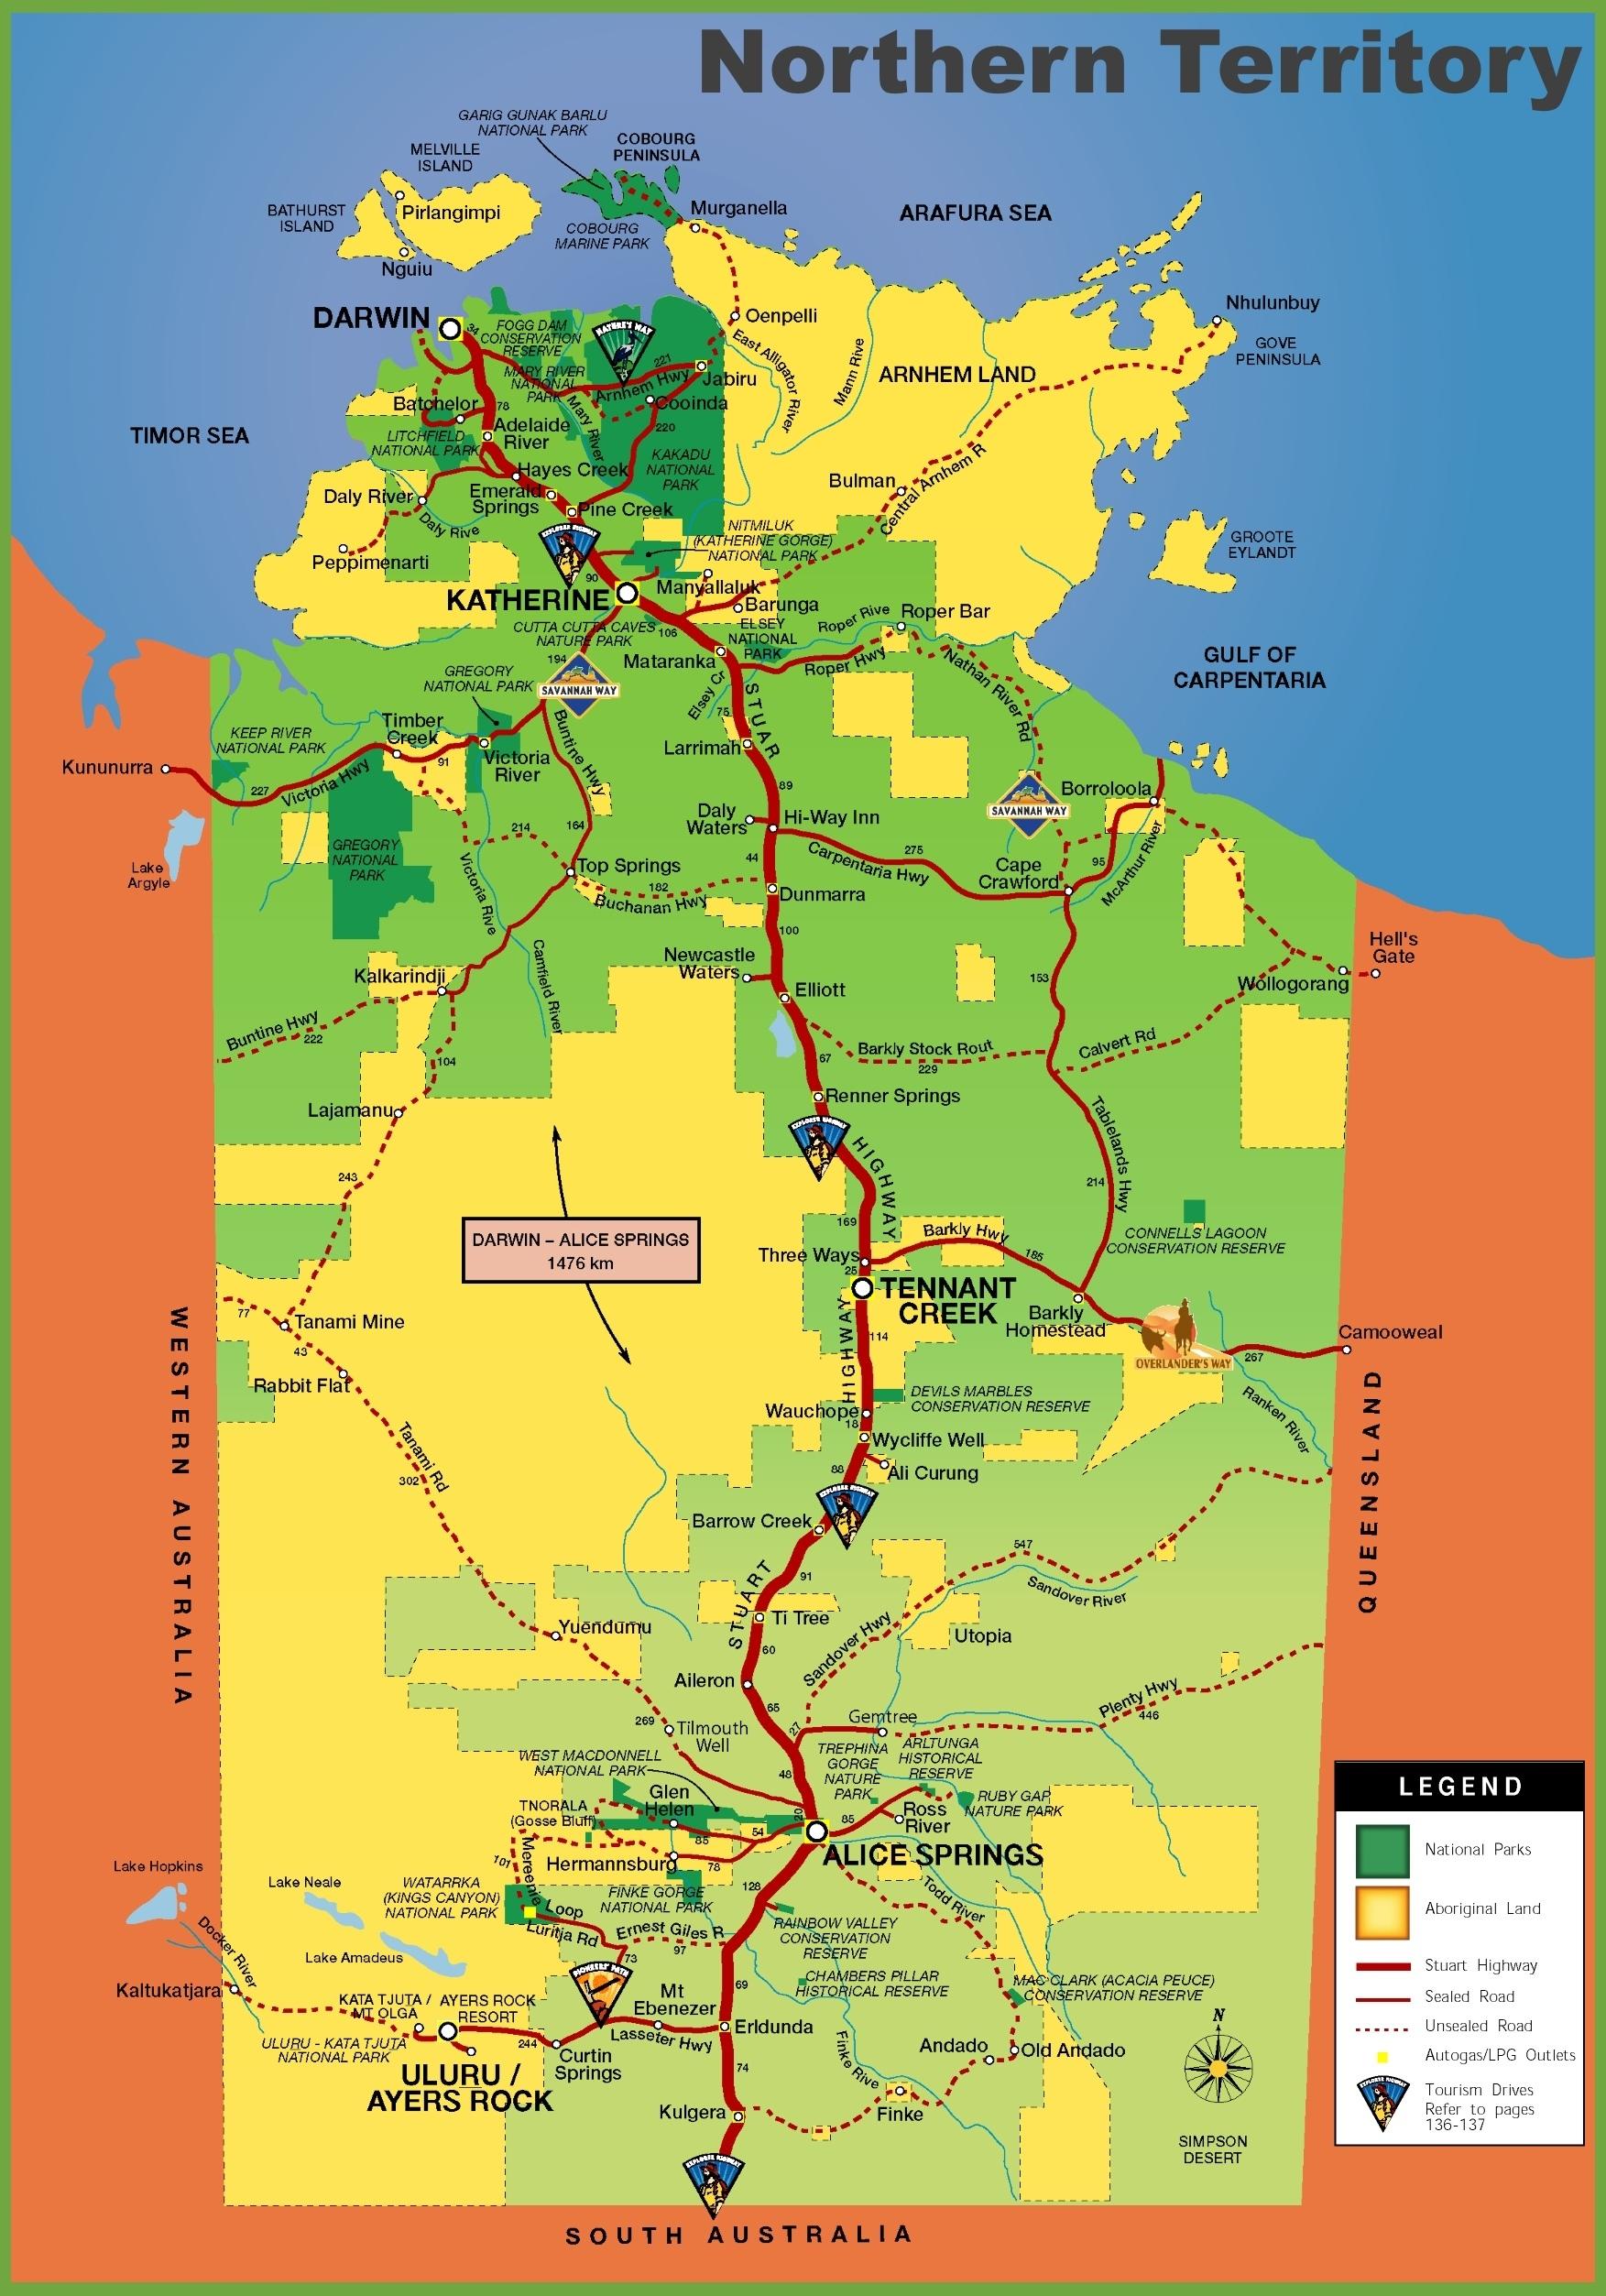 Northern Territory Tourist Map inside Northern Territory Map Australia